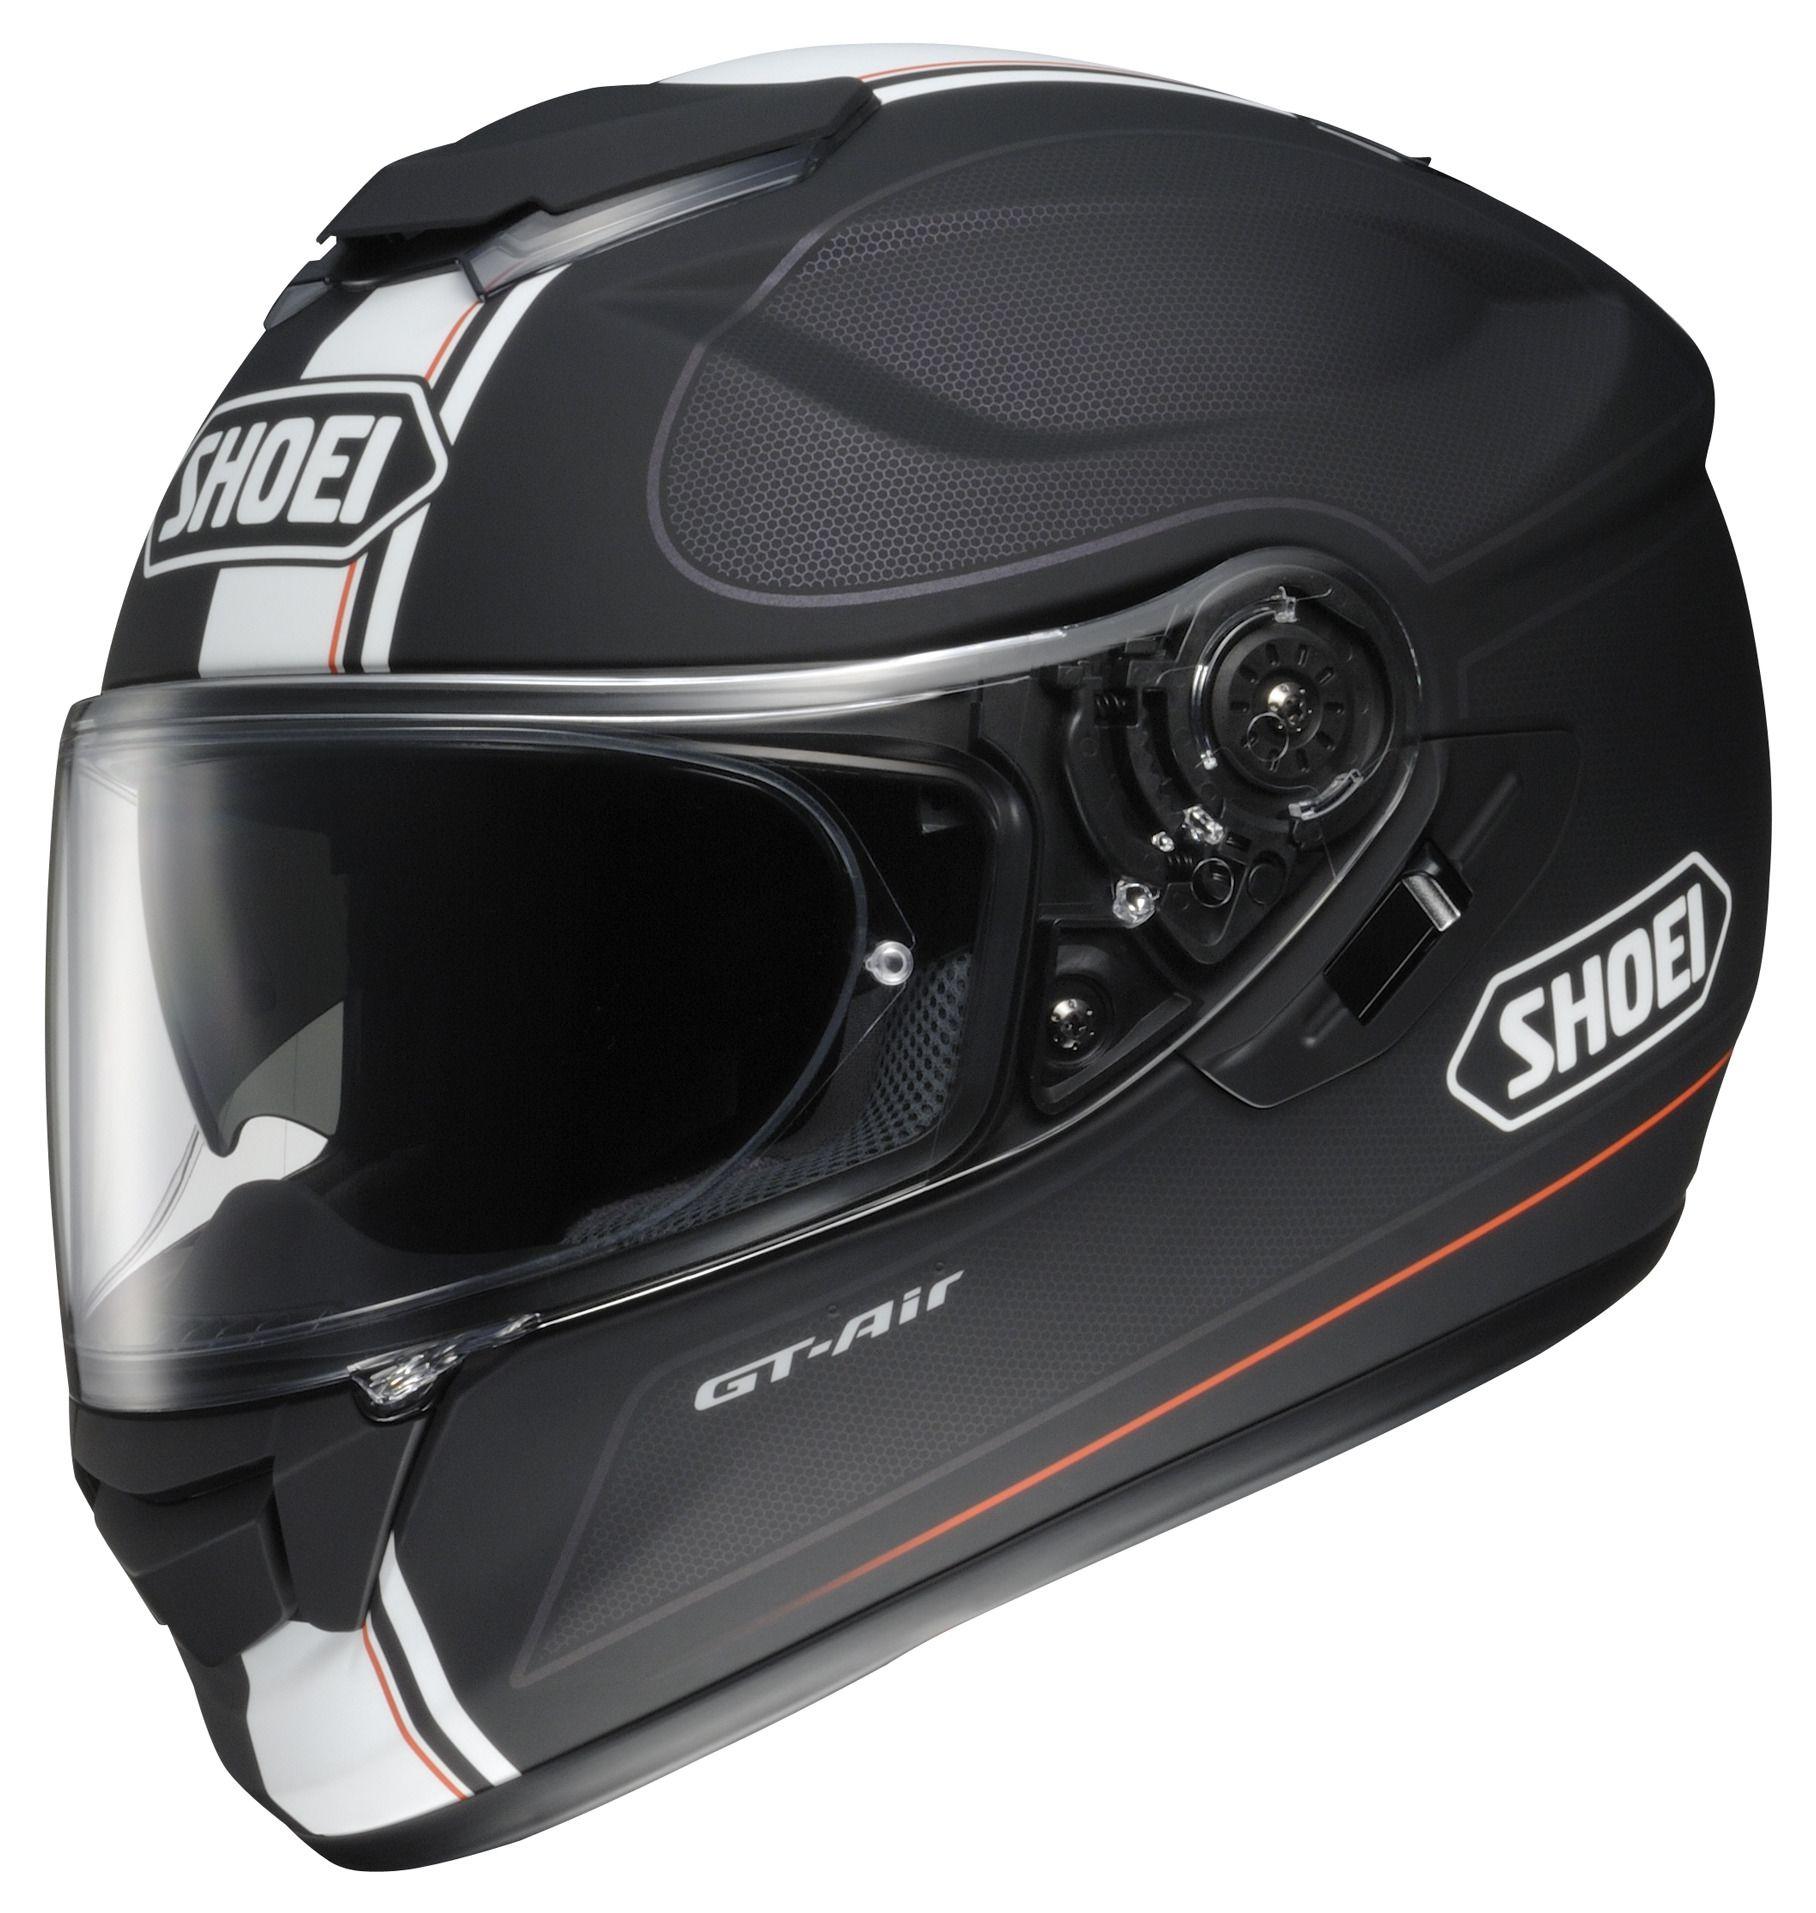 shoei gt air wanderer helmet revzilla. Black Bedroom Furniture Sets. Home Design Ideas